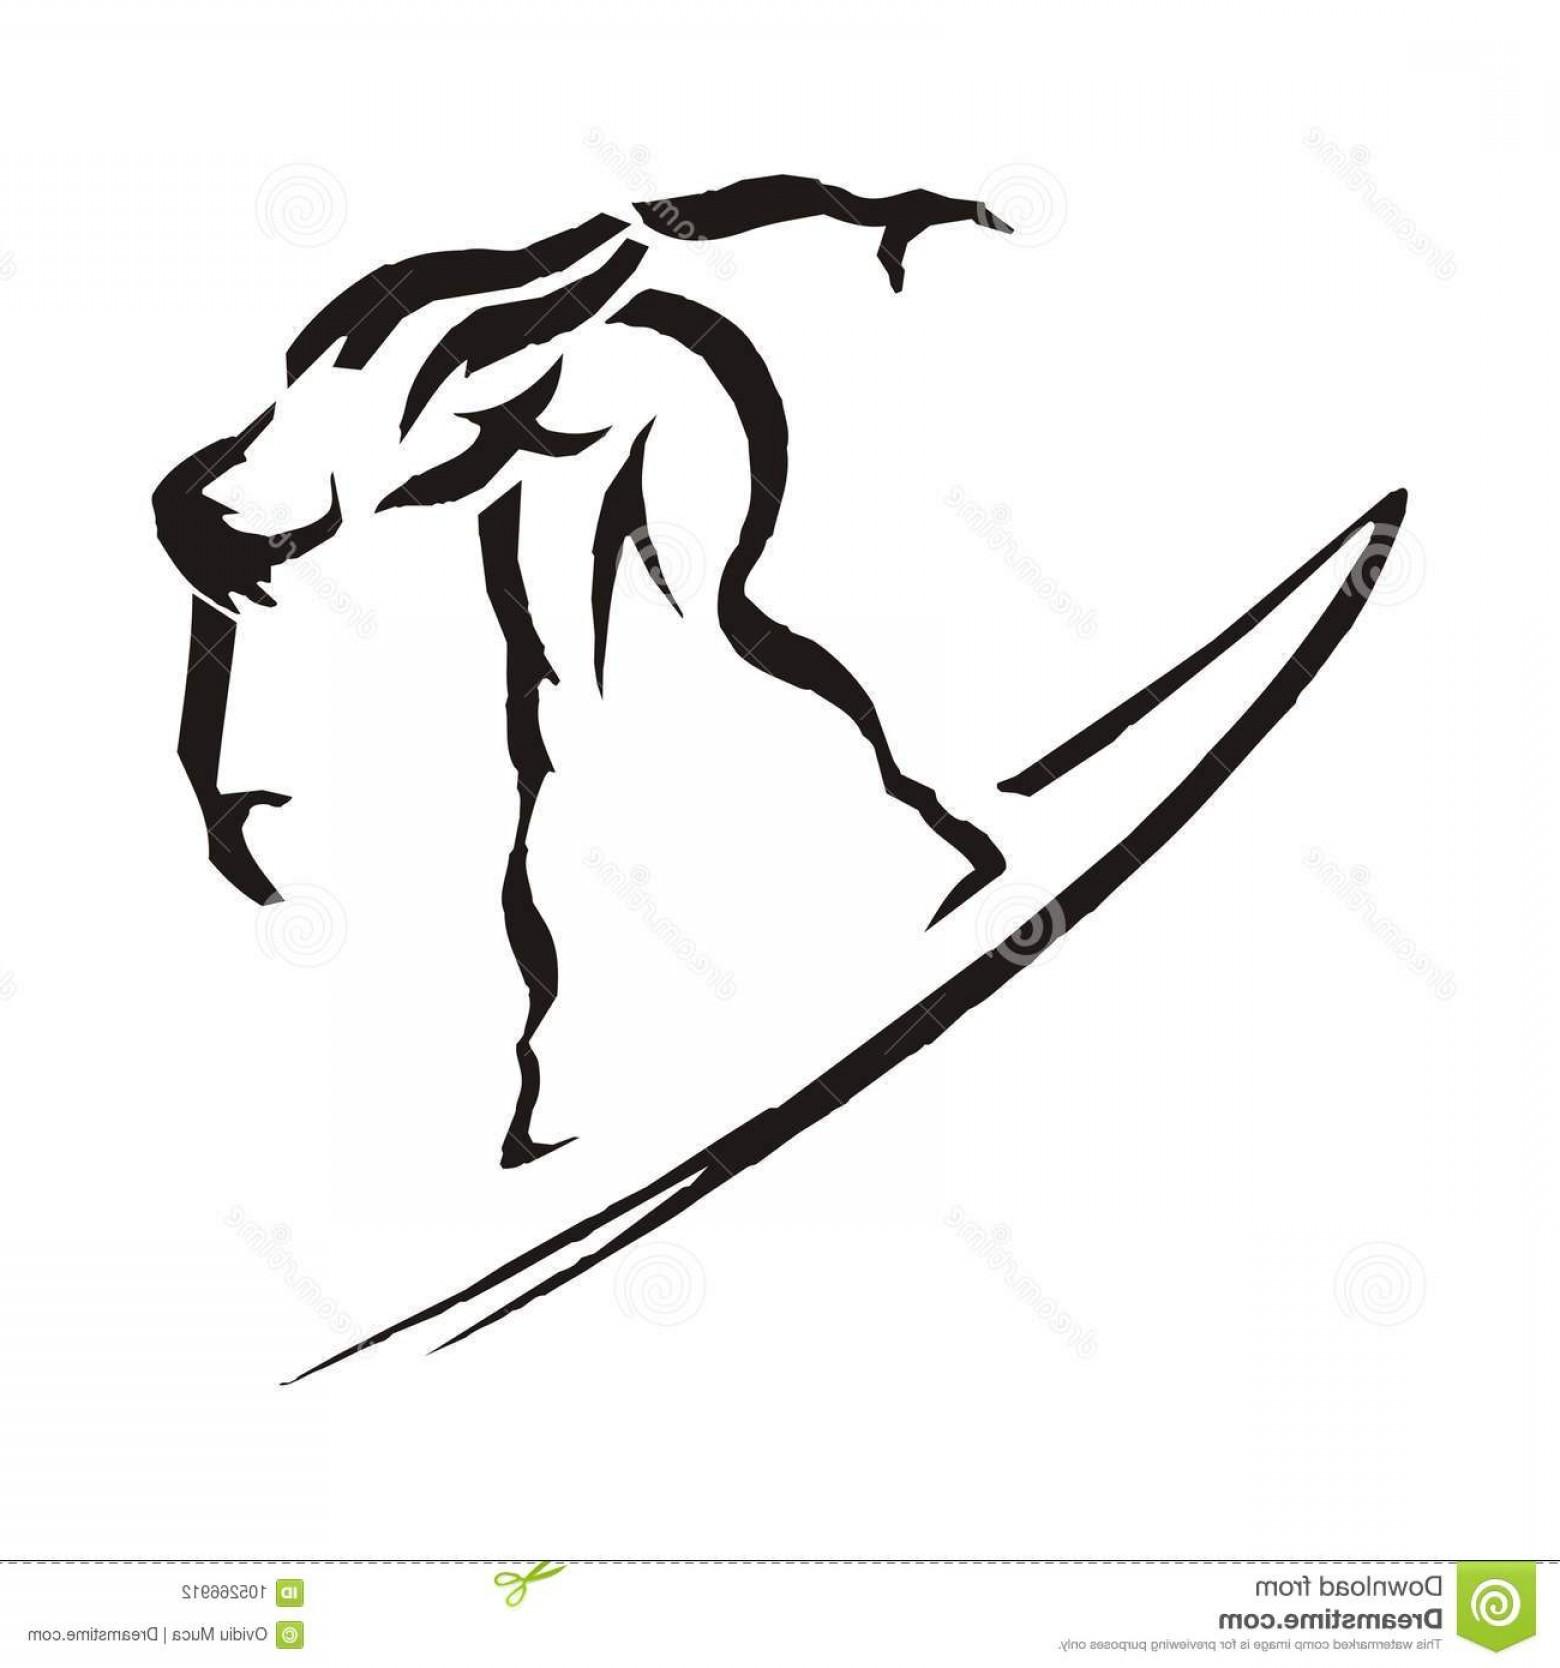 1560x1668 Surfer Vector Art Silhouette Board Design Draw Graphic Surfboard